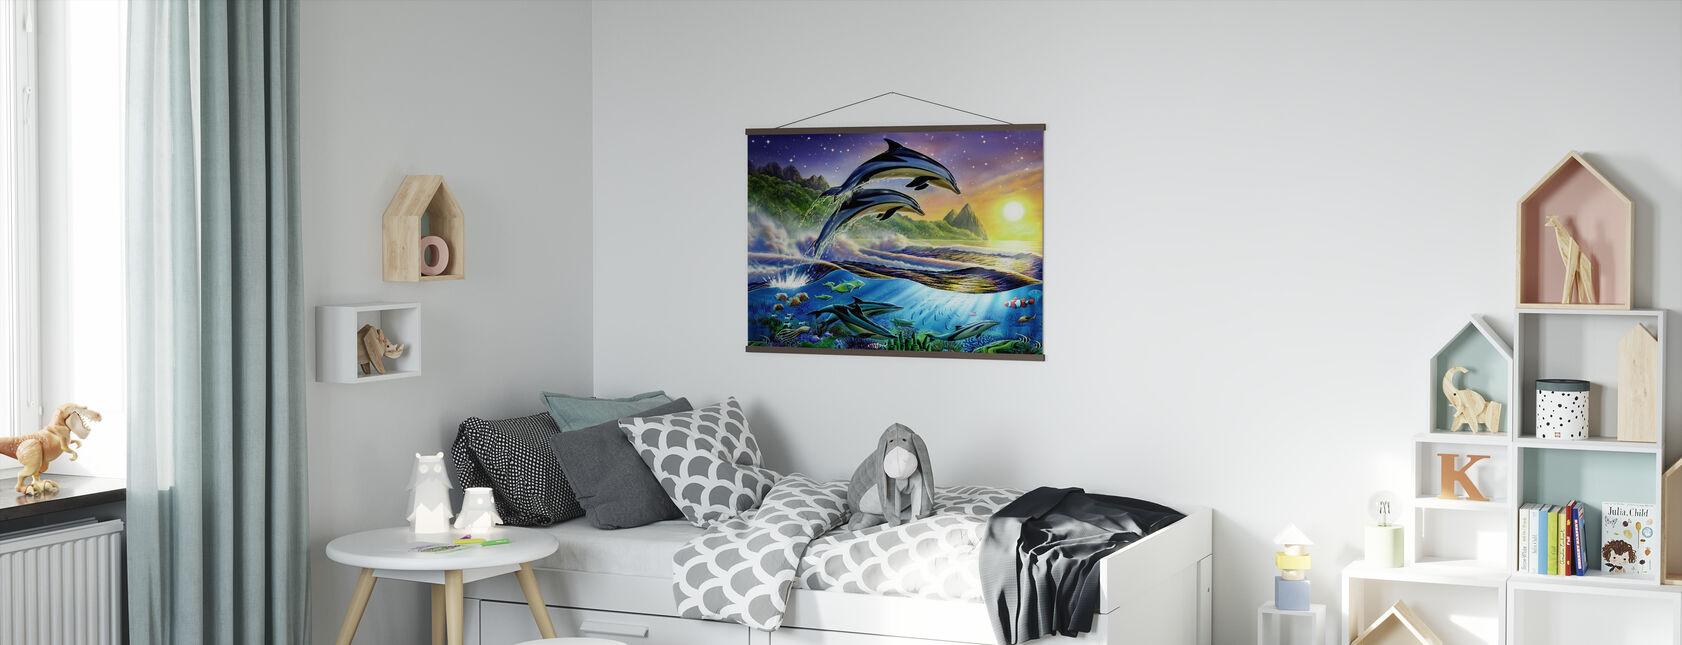 Atlantic Dolphins - Poster - Kids Room